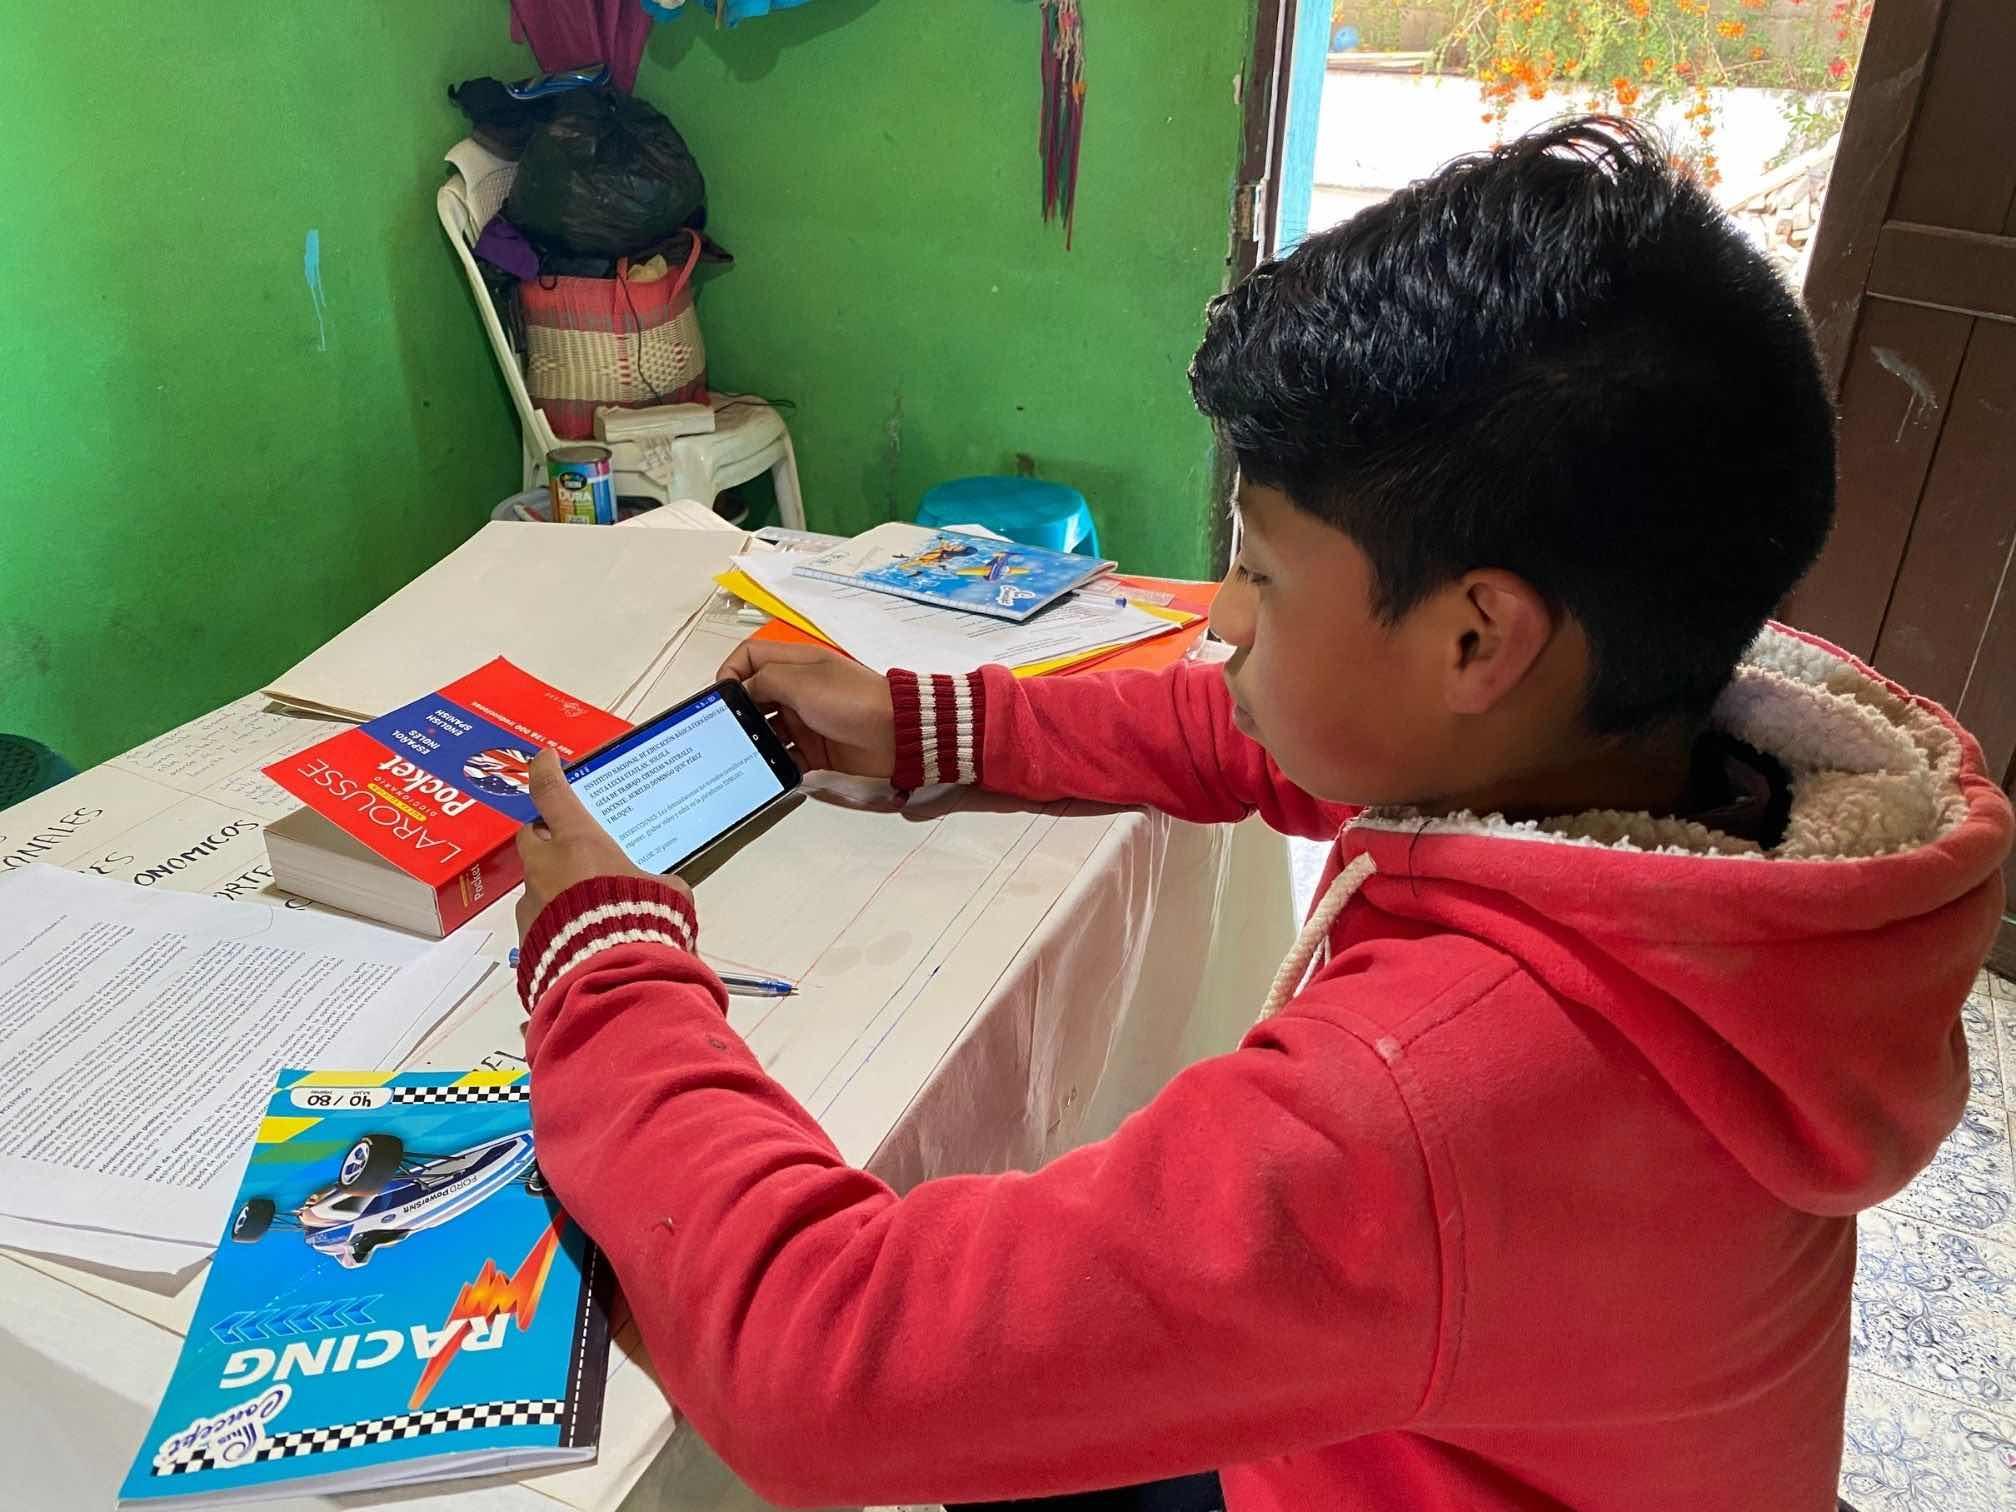 Guatemalan boy using cell phone to do his homework